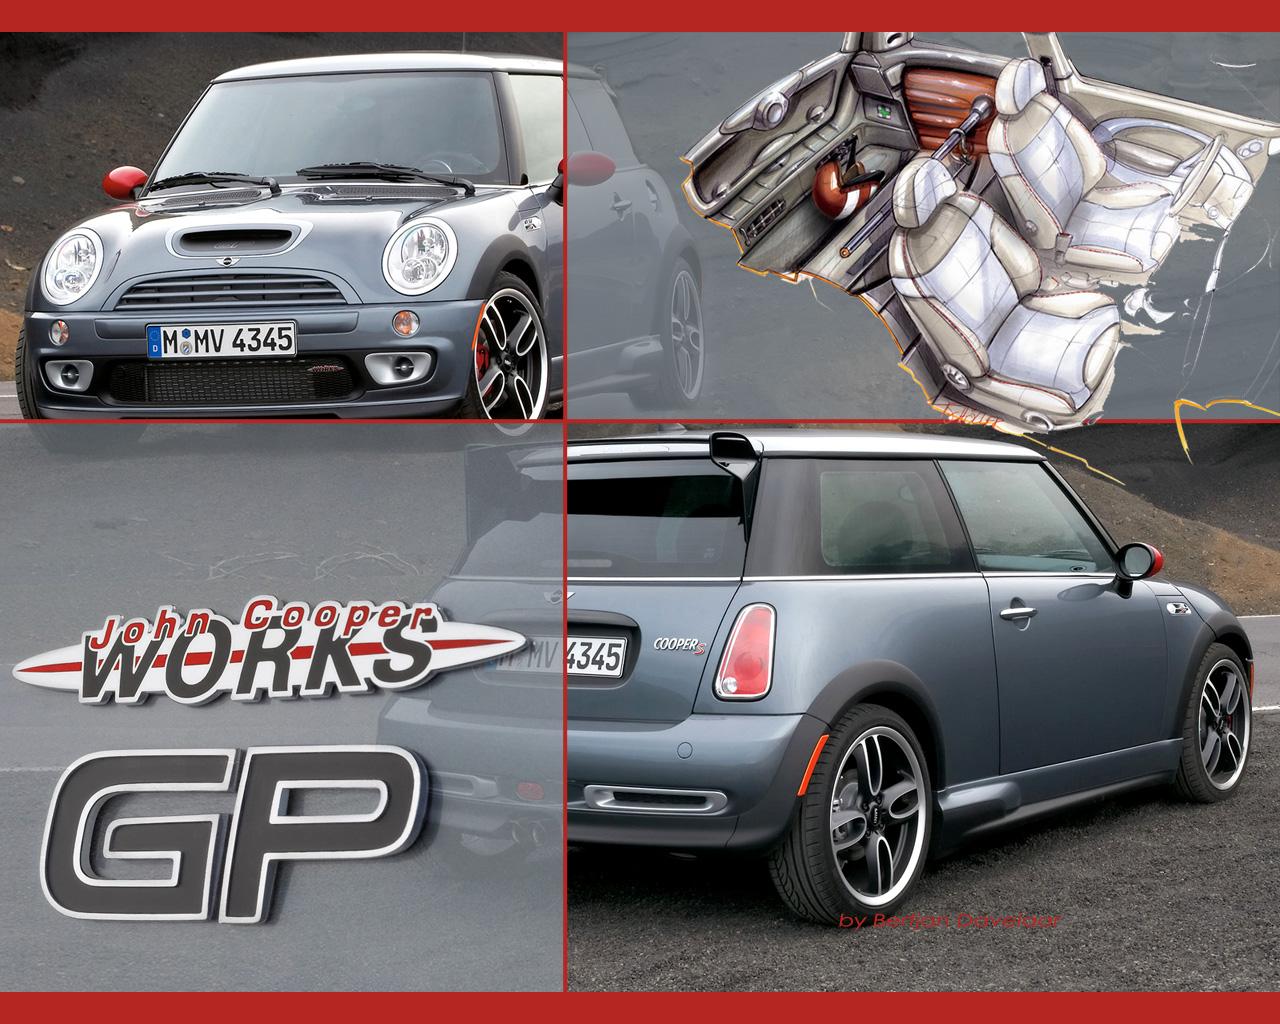 mini cooper gp picture 5 reviews news specs buy car. Black Bedroom Furniture Sets. Home Design Ideas